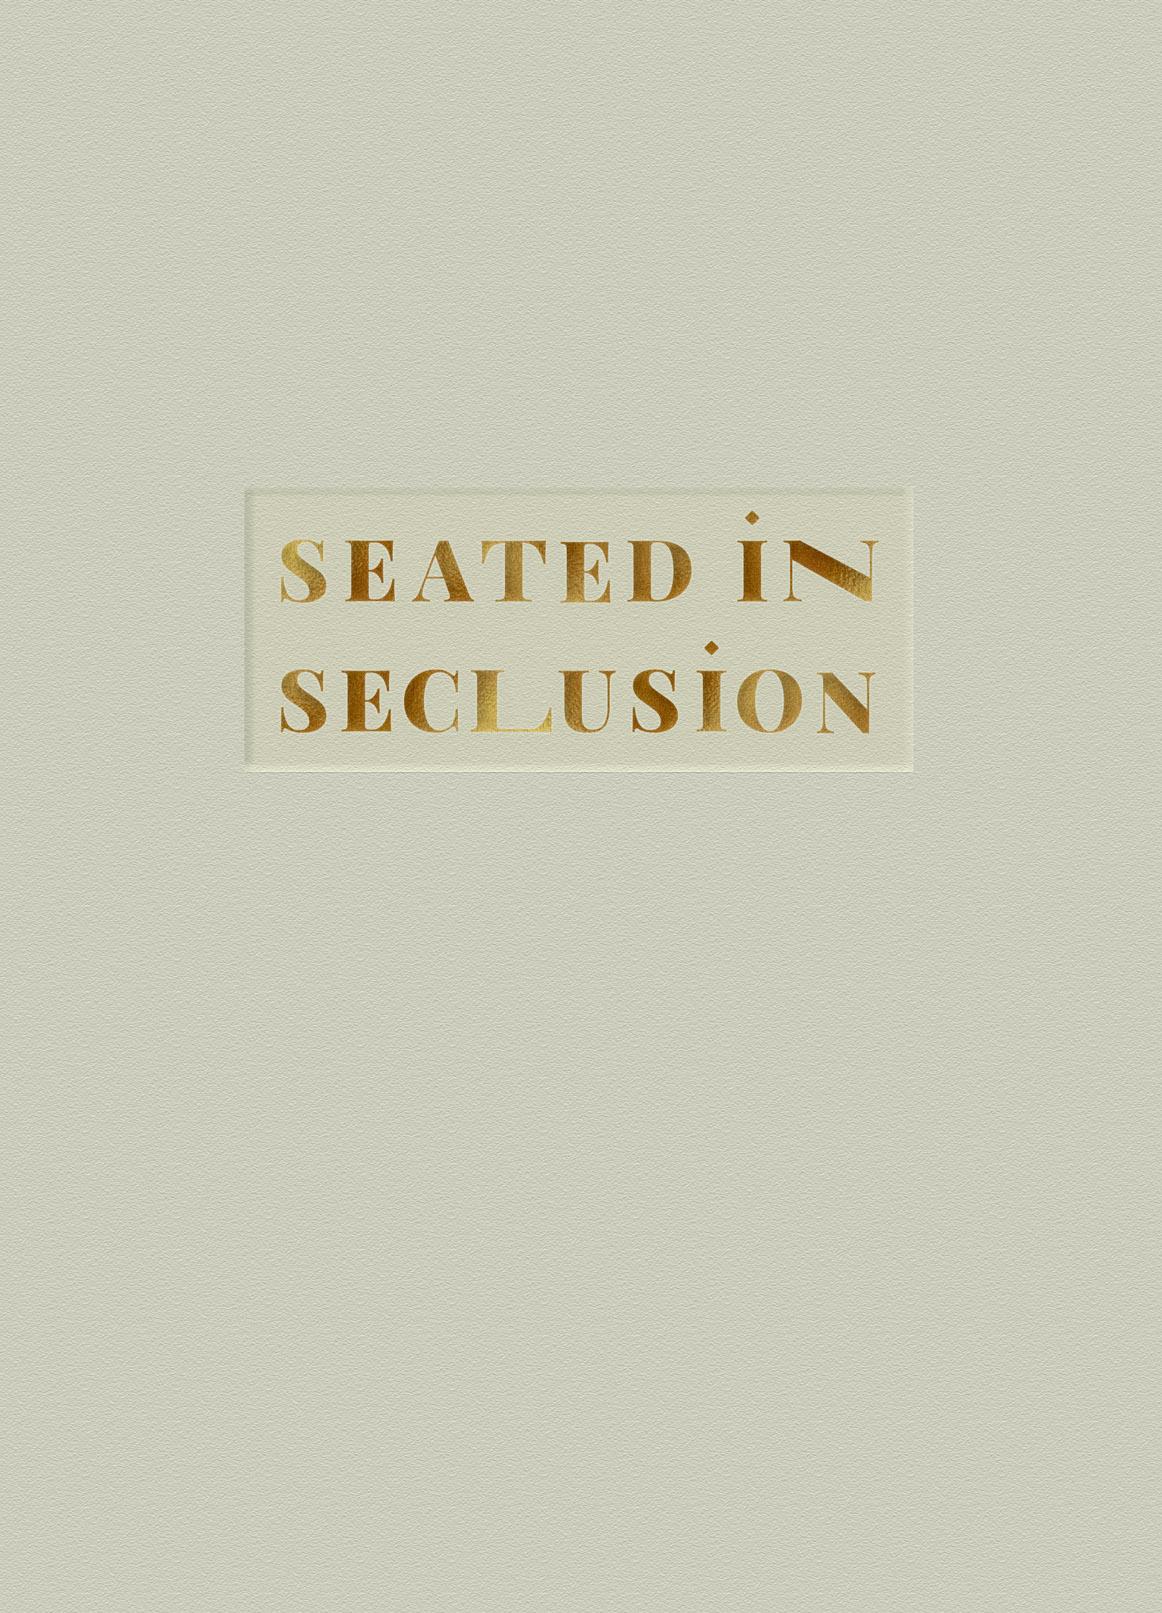 Seated In Seclusion: Bratslav Hasidim And Contemporary Design